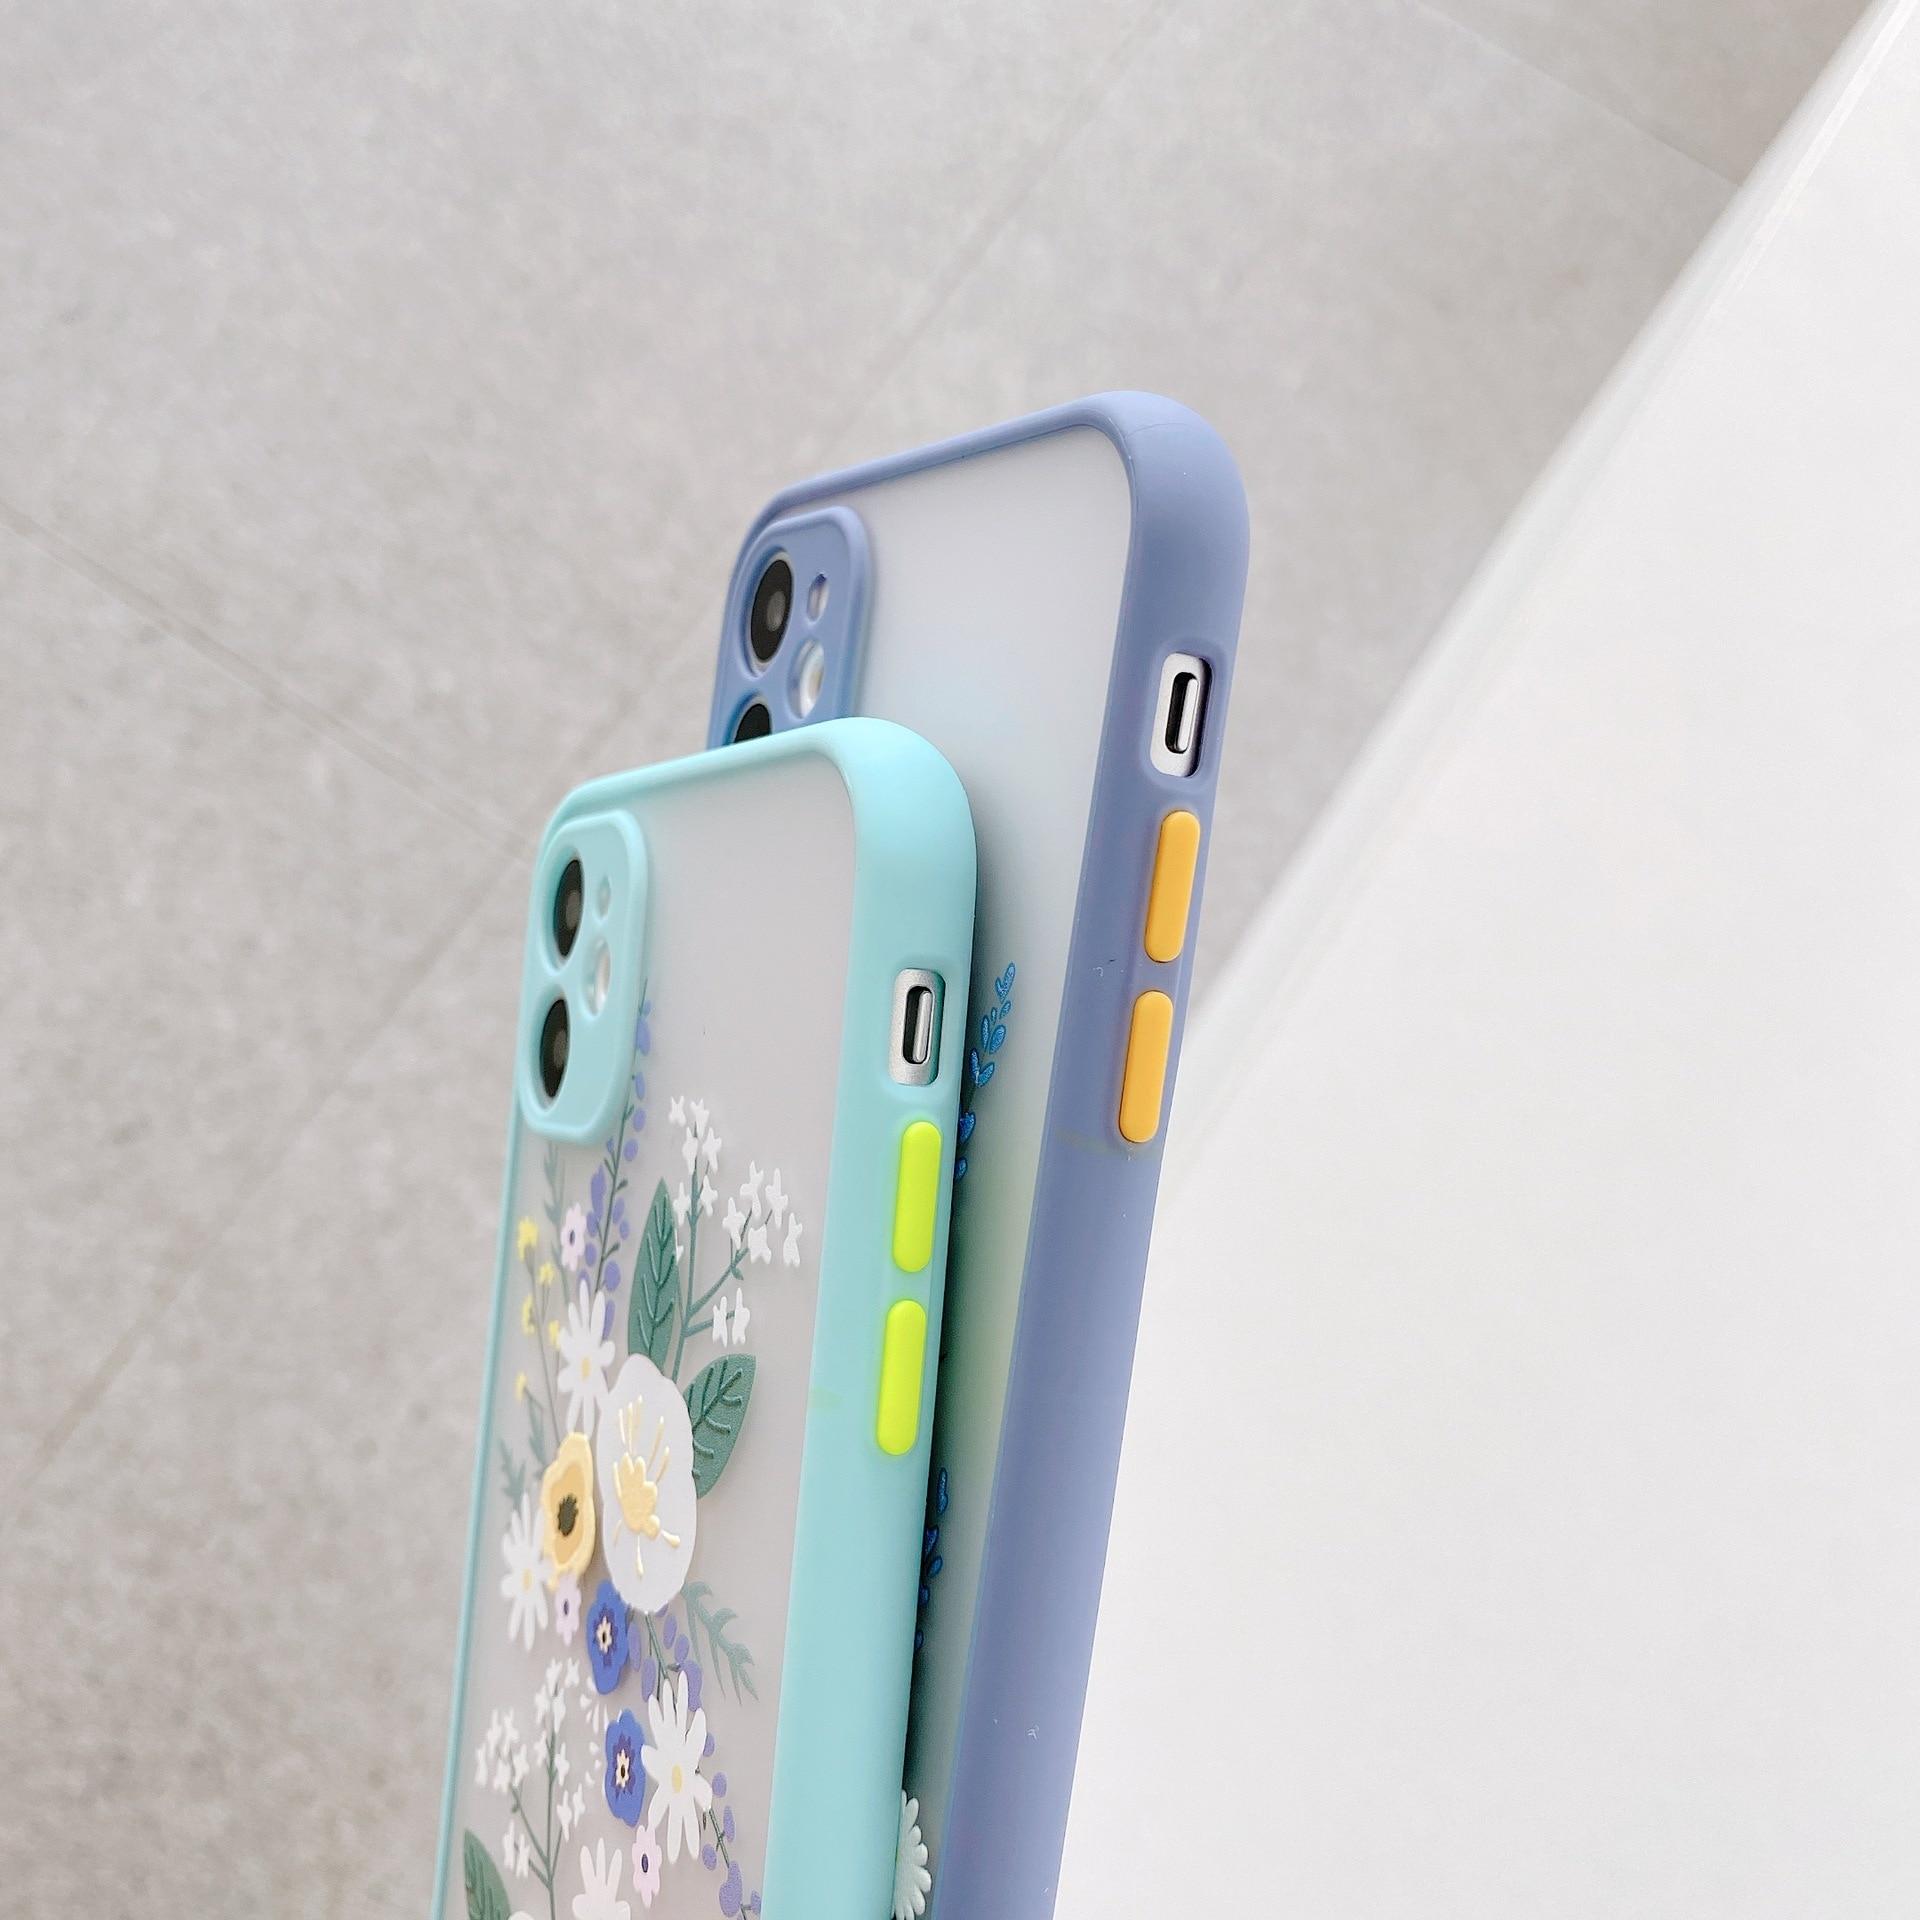 Luxury 3D Relief Flower Case For iPhone 12 Mini 11 Pro Max X XR XS Max 7 8 Plus Soft Bumper Transparent Matte PC Back Cover